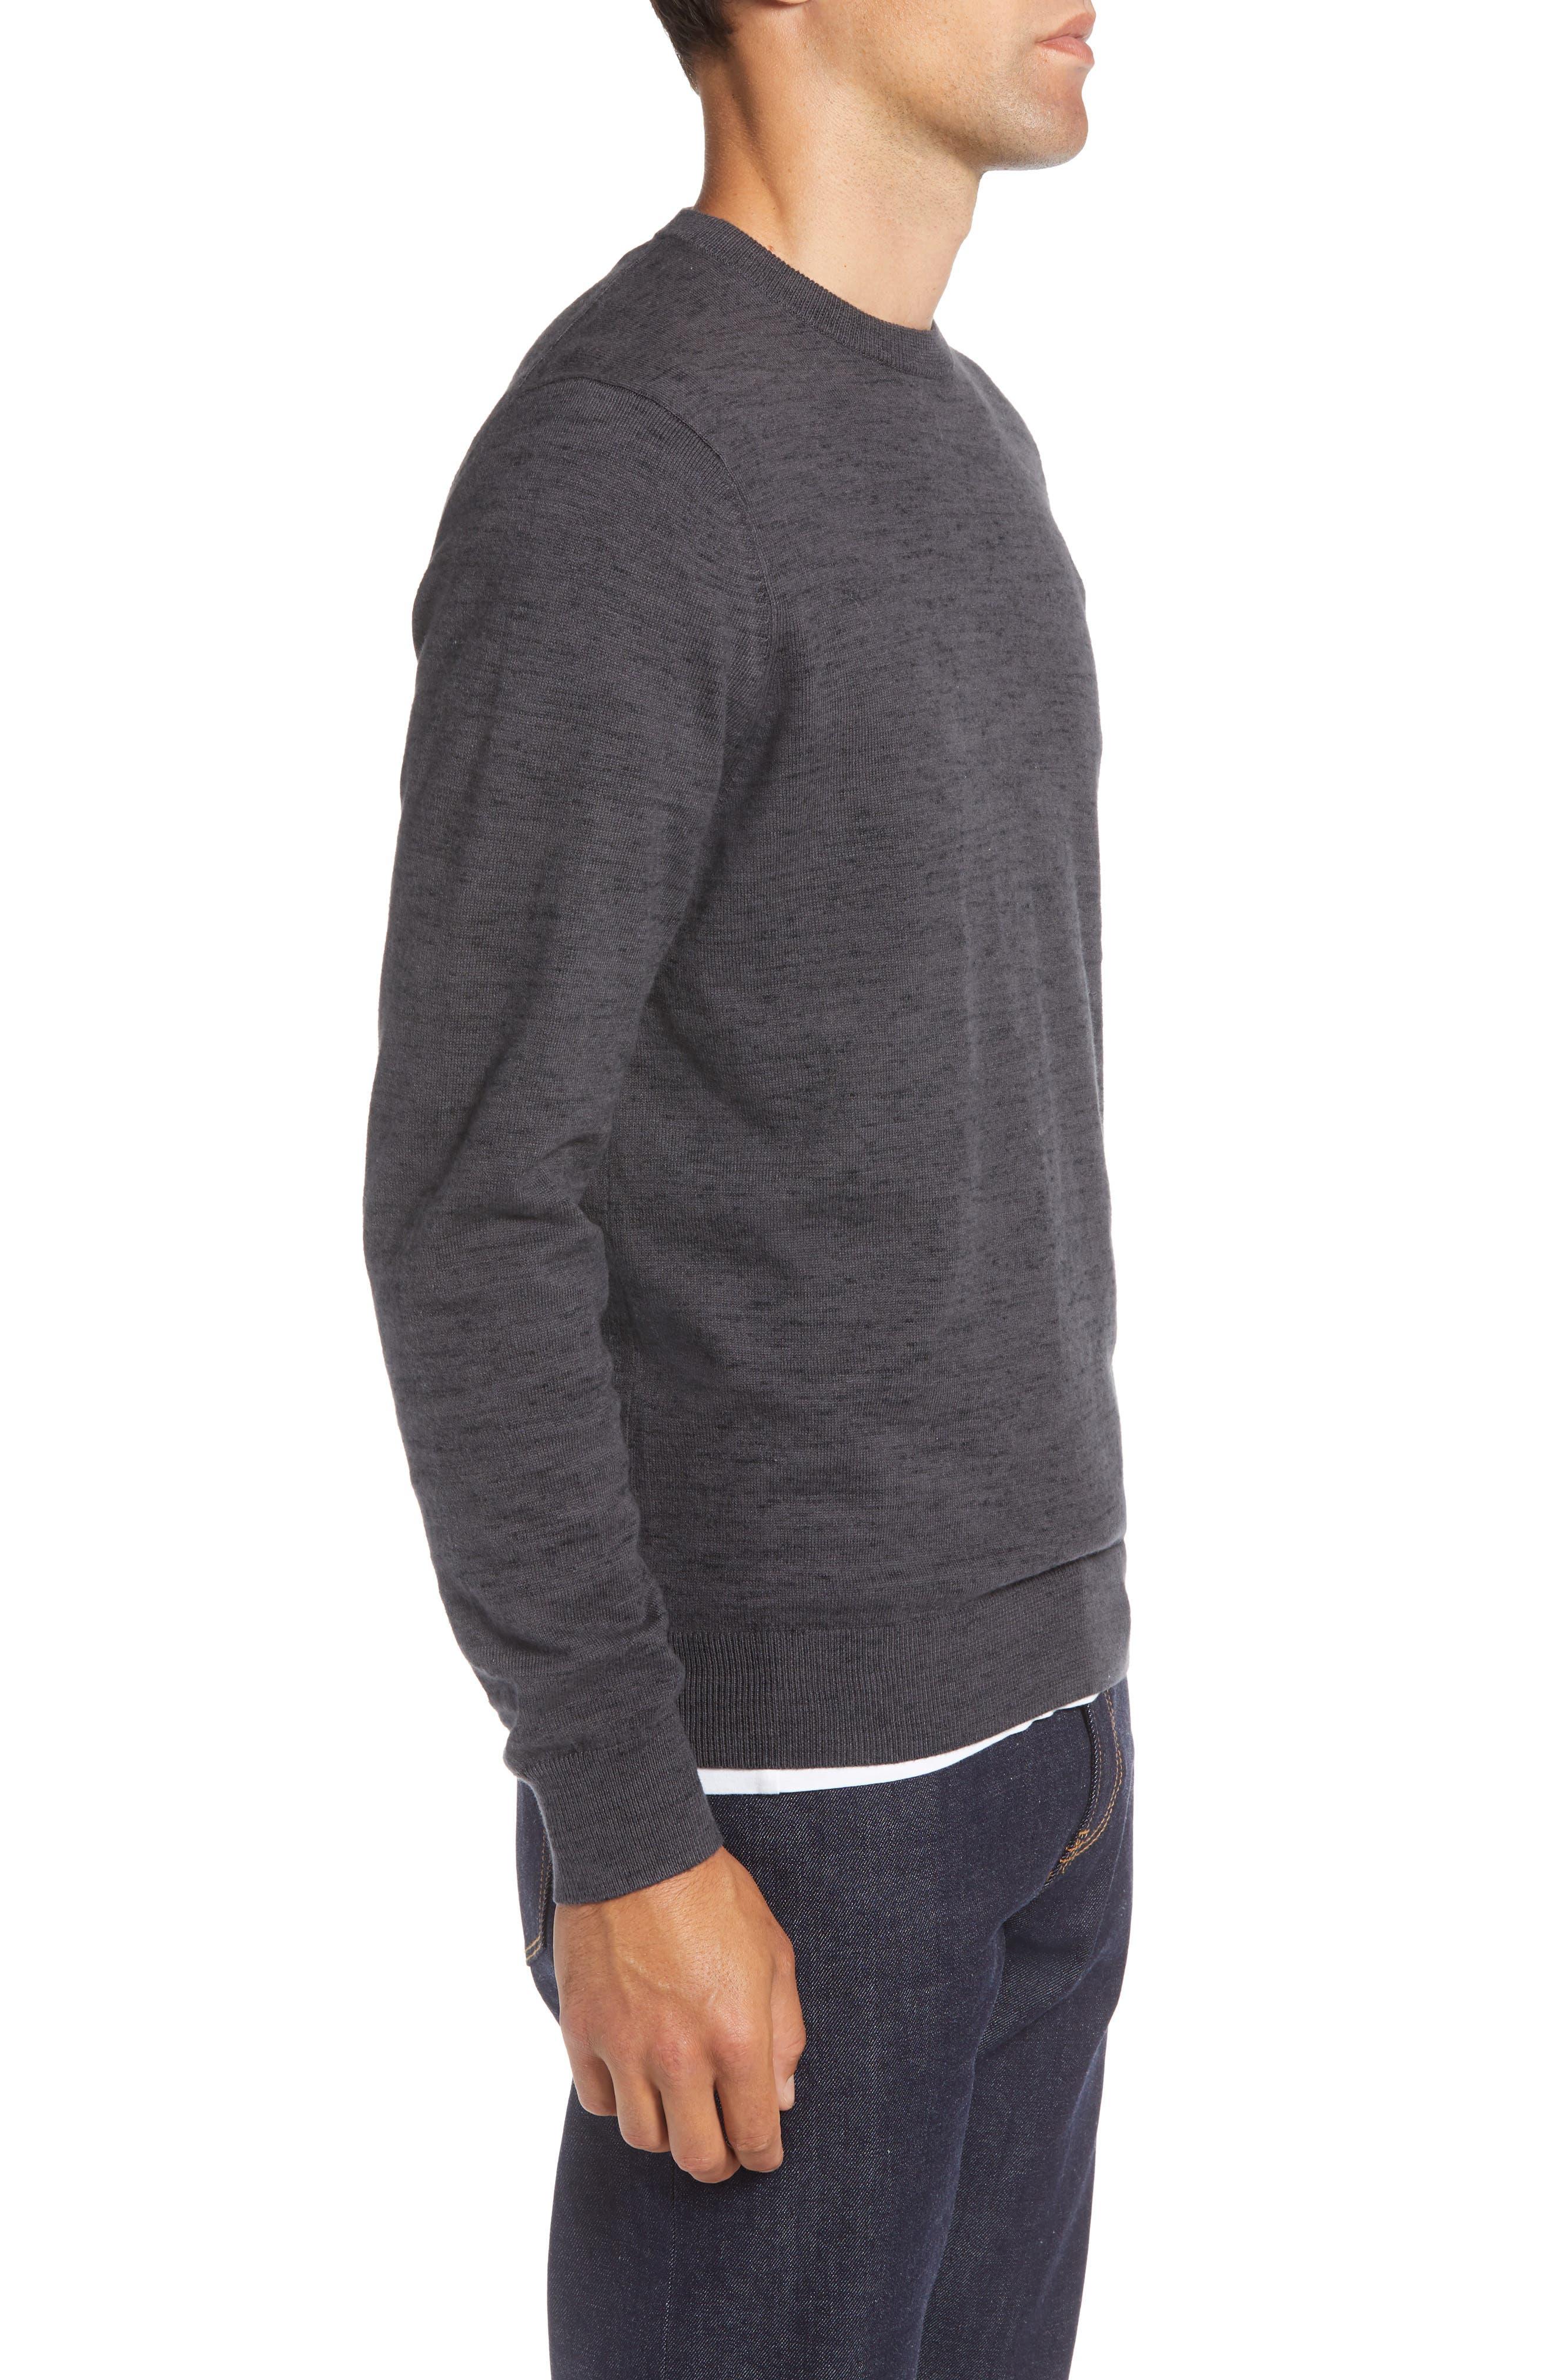 Regular Fit Crewneck Sweater,                             Alternate thumbnail 3, color,                             GREY DARK CHARCOAL HEATHER